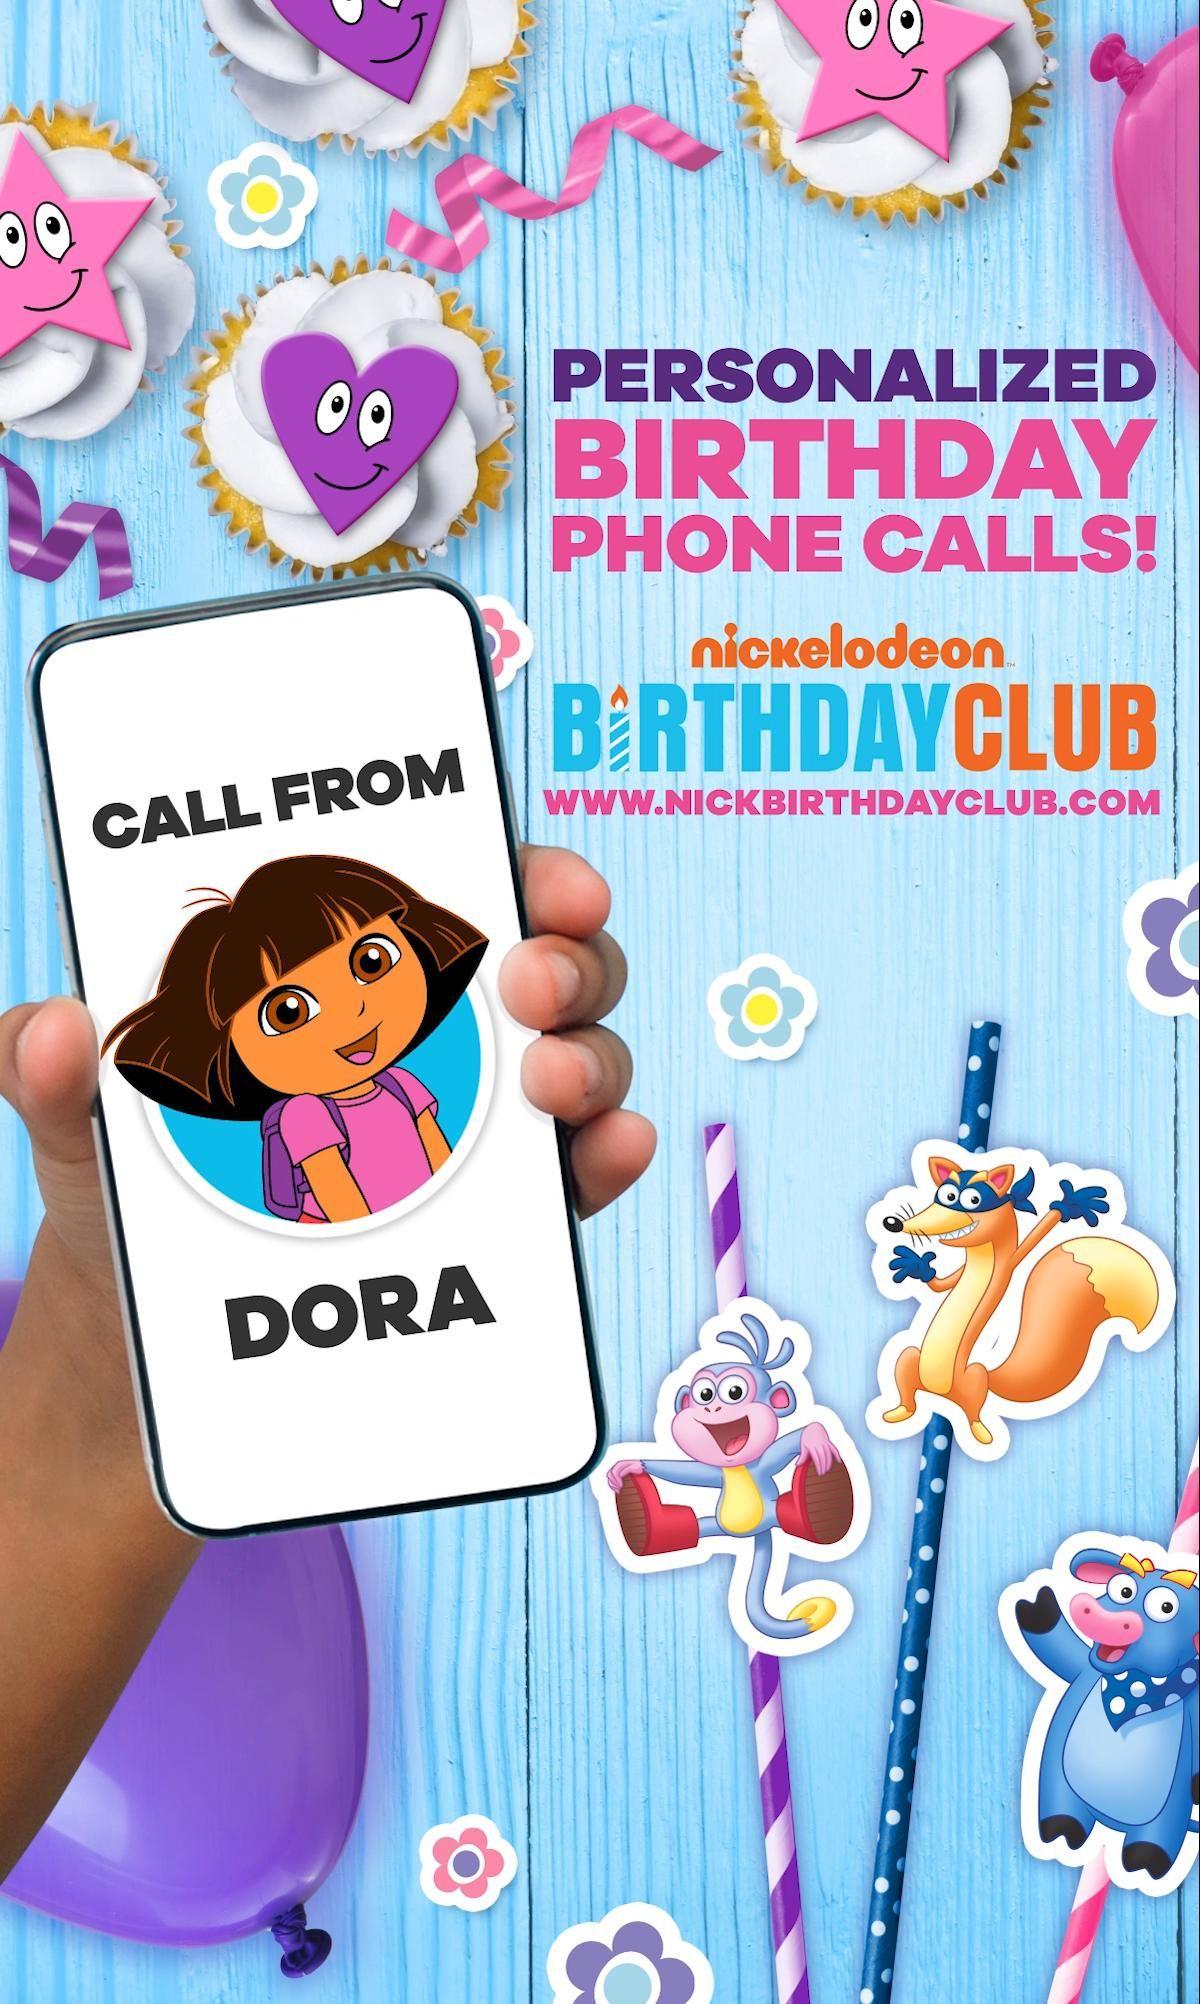 Happy Birthday Call From Spongebob : happy, birthday, spongebob, Birthday, Phone, Explorer!, [Video], Stuff,, Club,, Friends